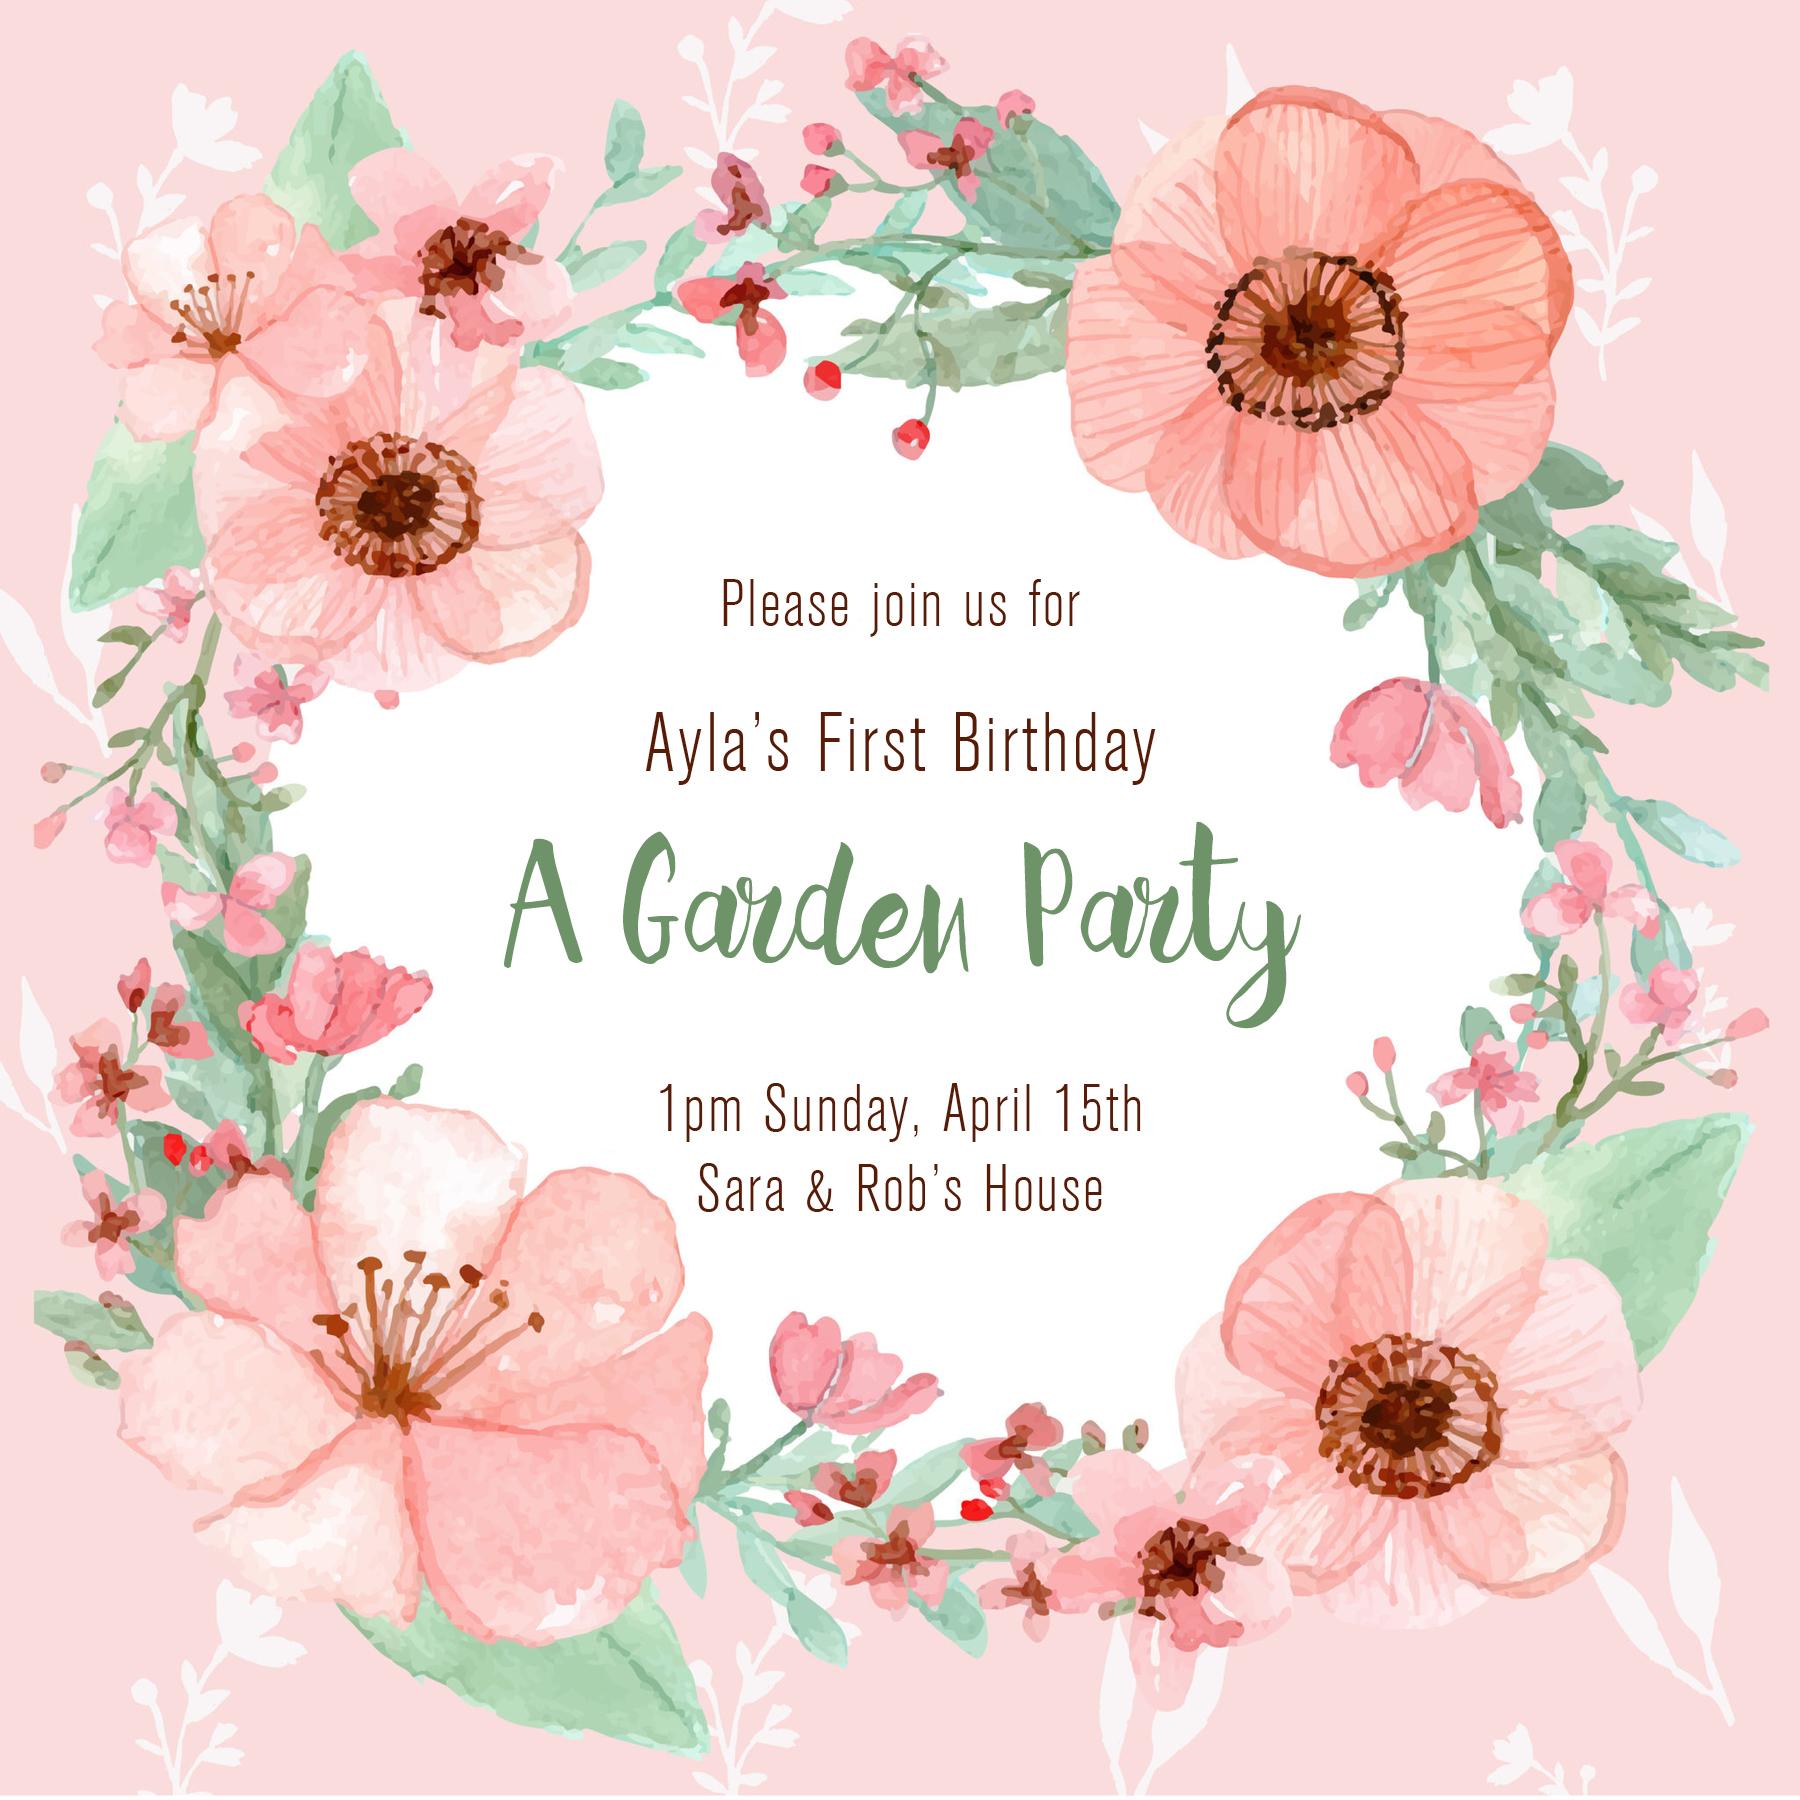 Ayla's First Birthday Party Invite.jpg